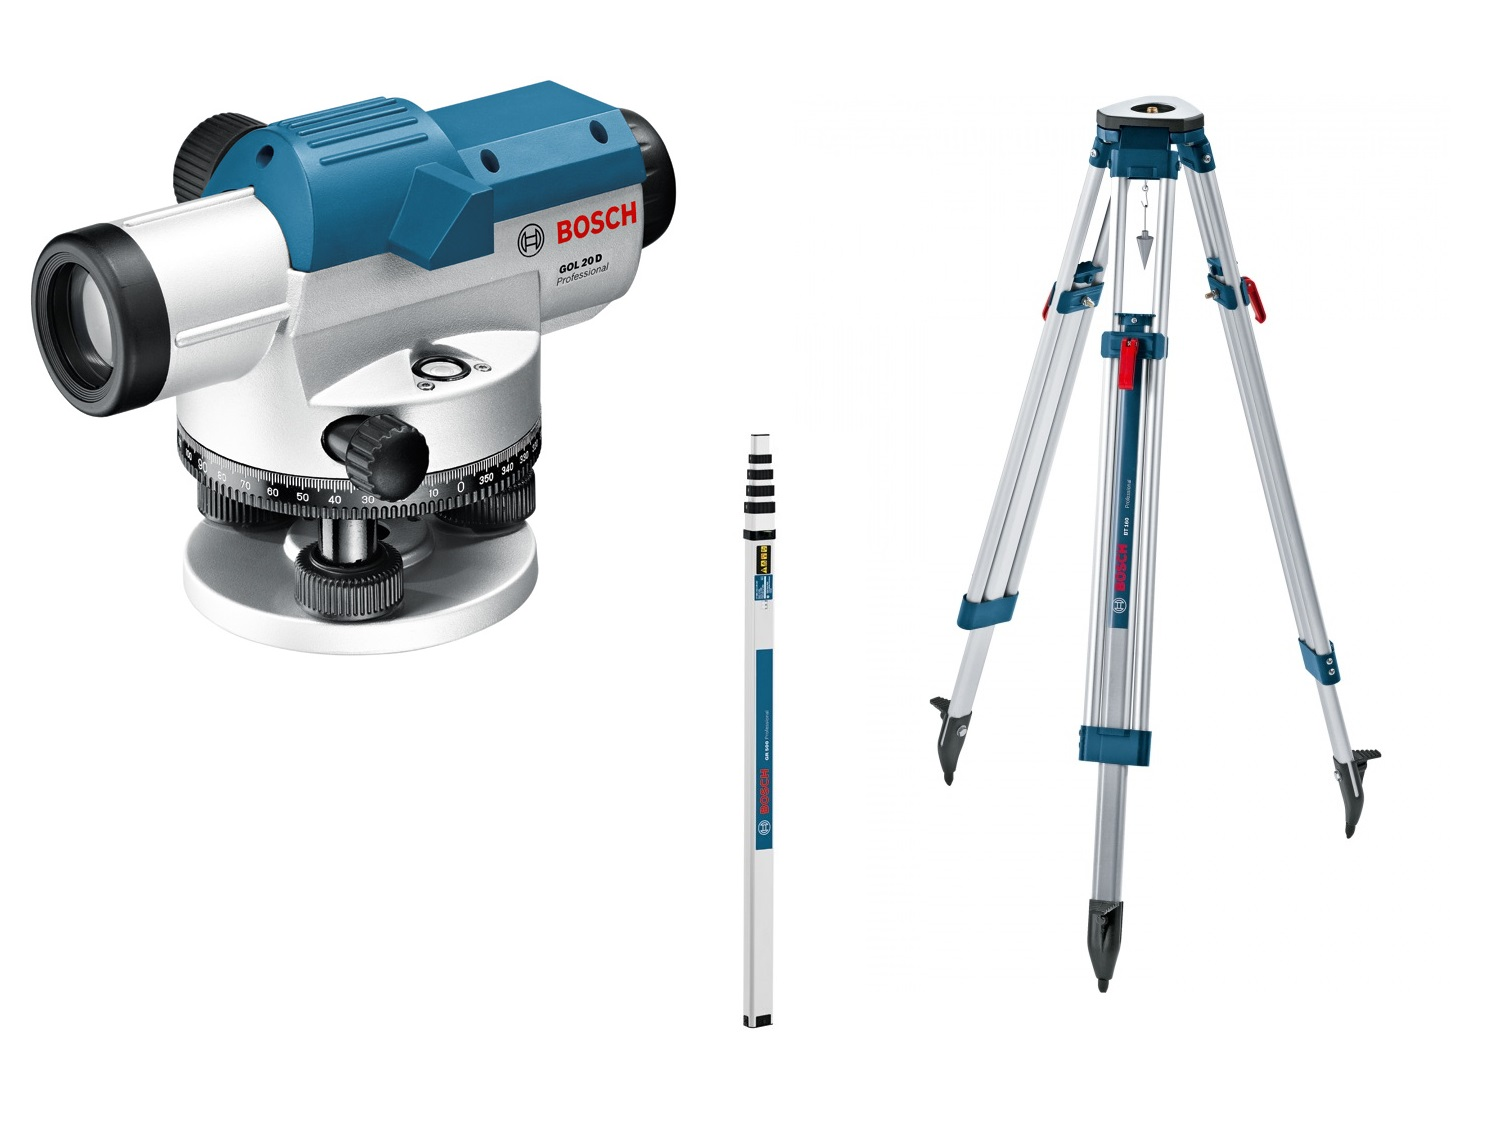 Оптический нивелир Bosch GOL 20 D + BT 160 + GR 500 Kit [0601068402]